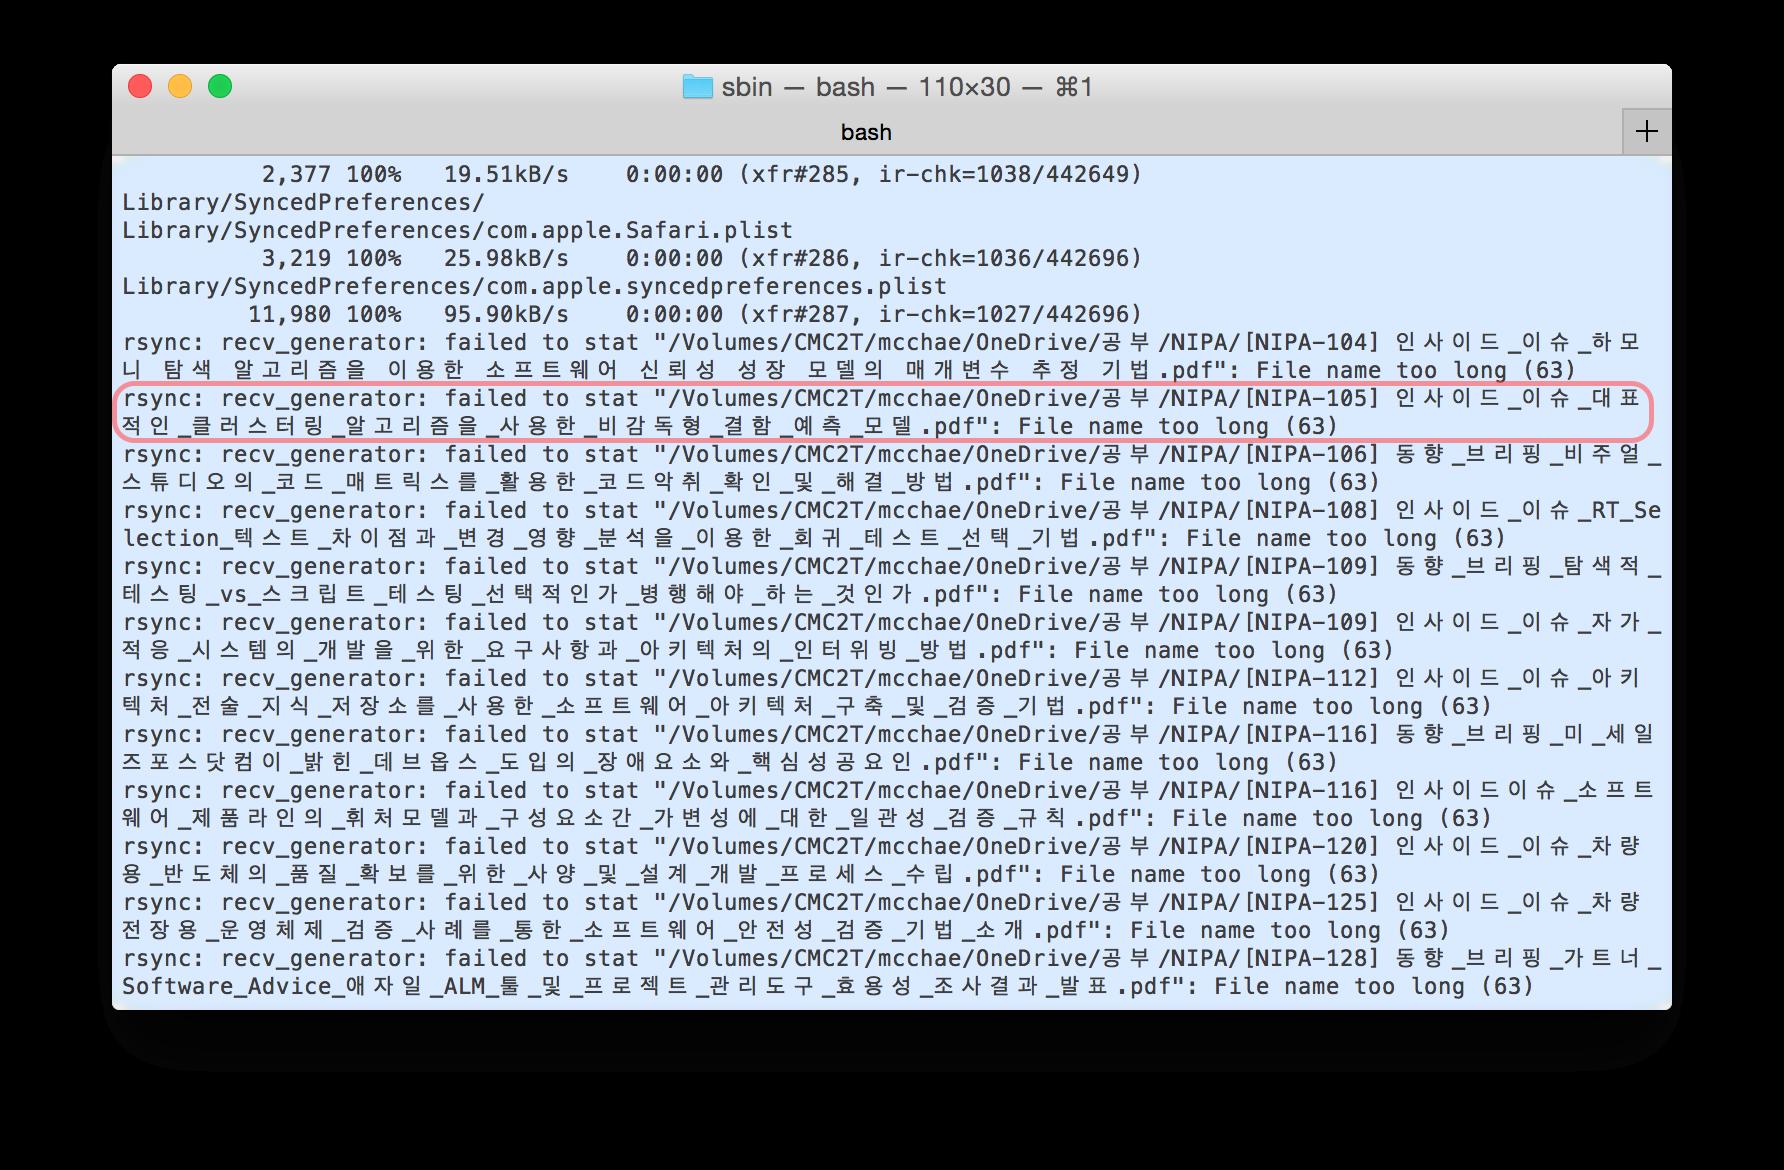 [OS X] rsync File name too long (63) 문..